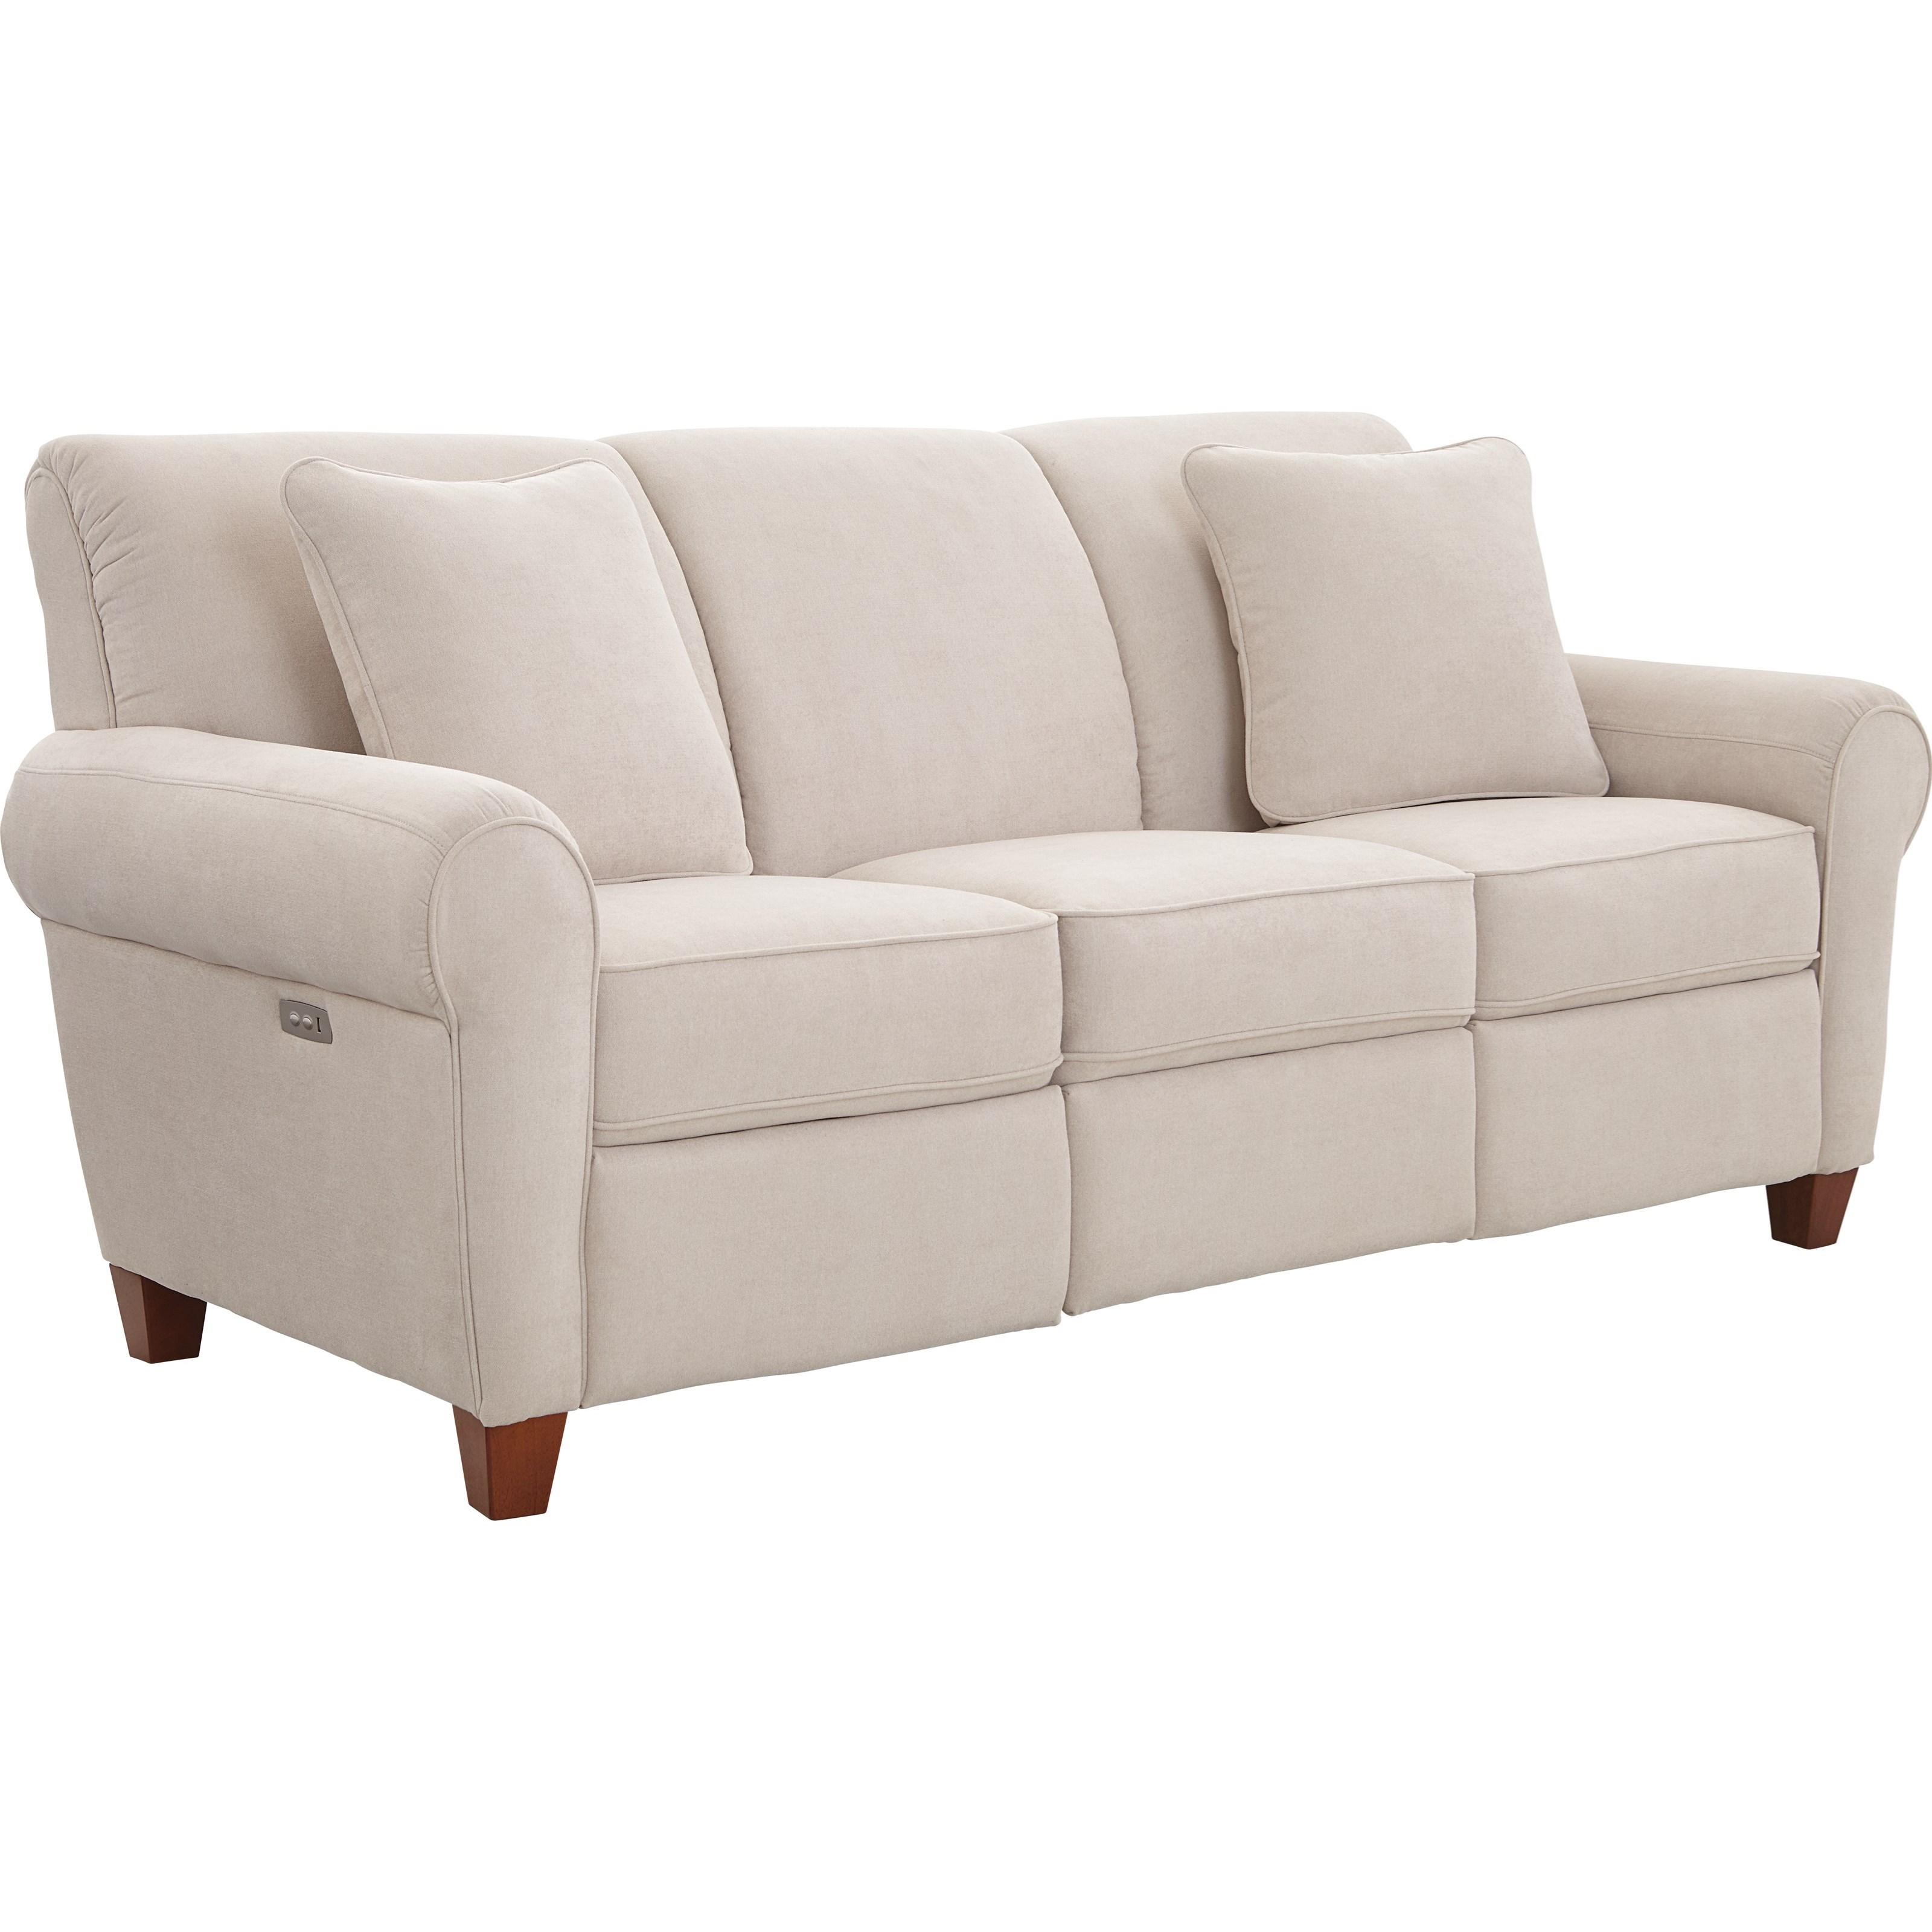 Bennett Duo™Reclining Sofa by La-Z-Boy at Jordan's Home Furnishings